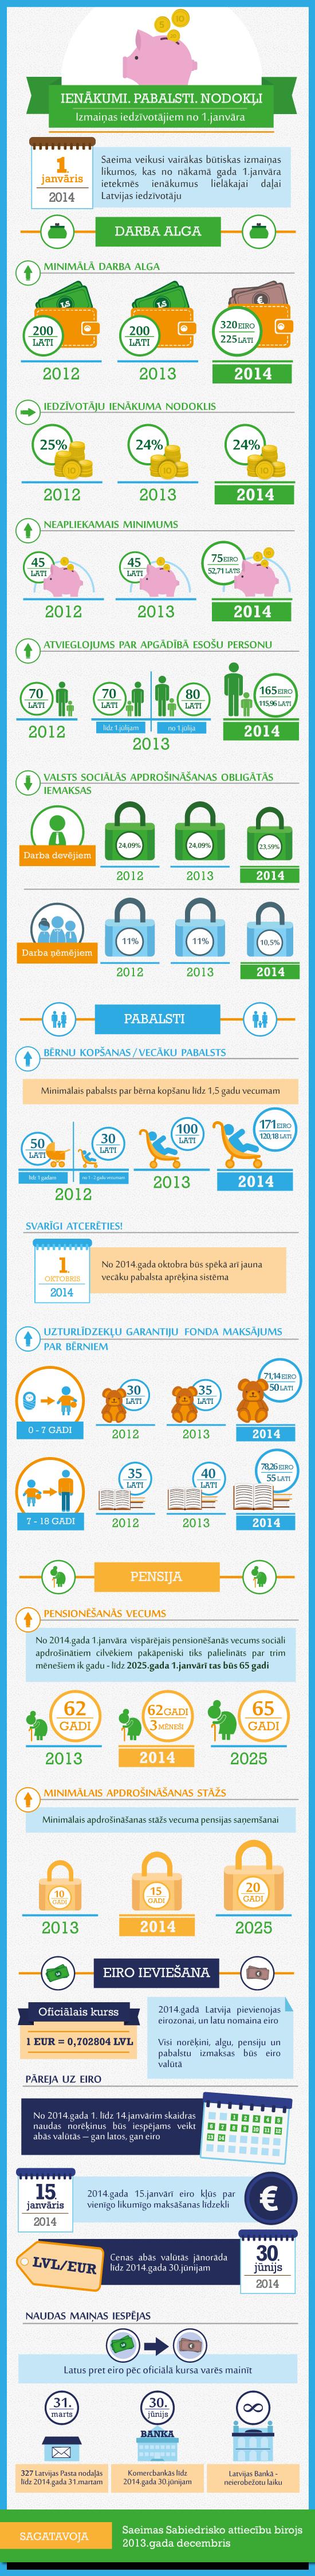 2014_izmainas_web